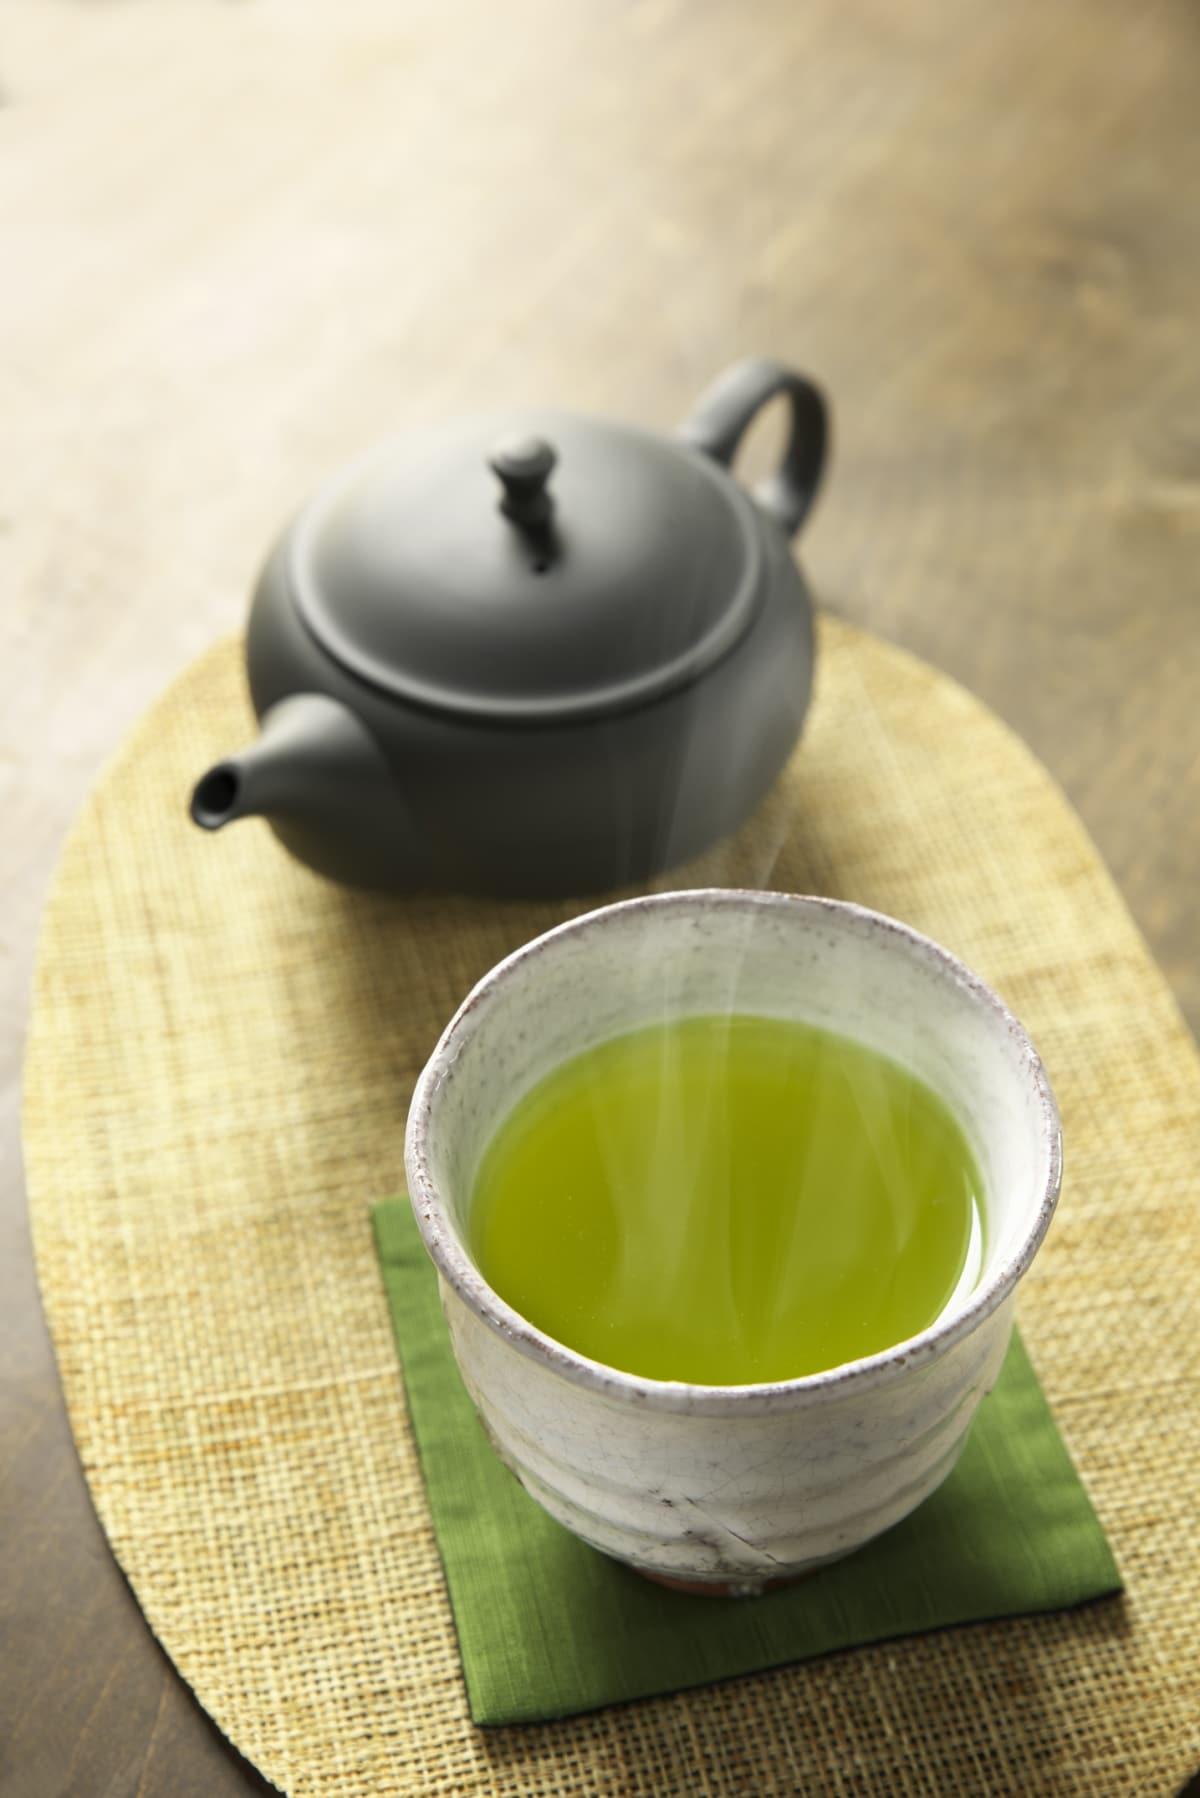 10. Green Tea